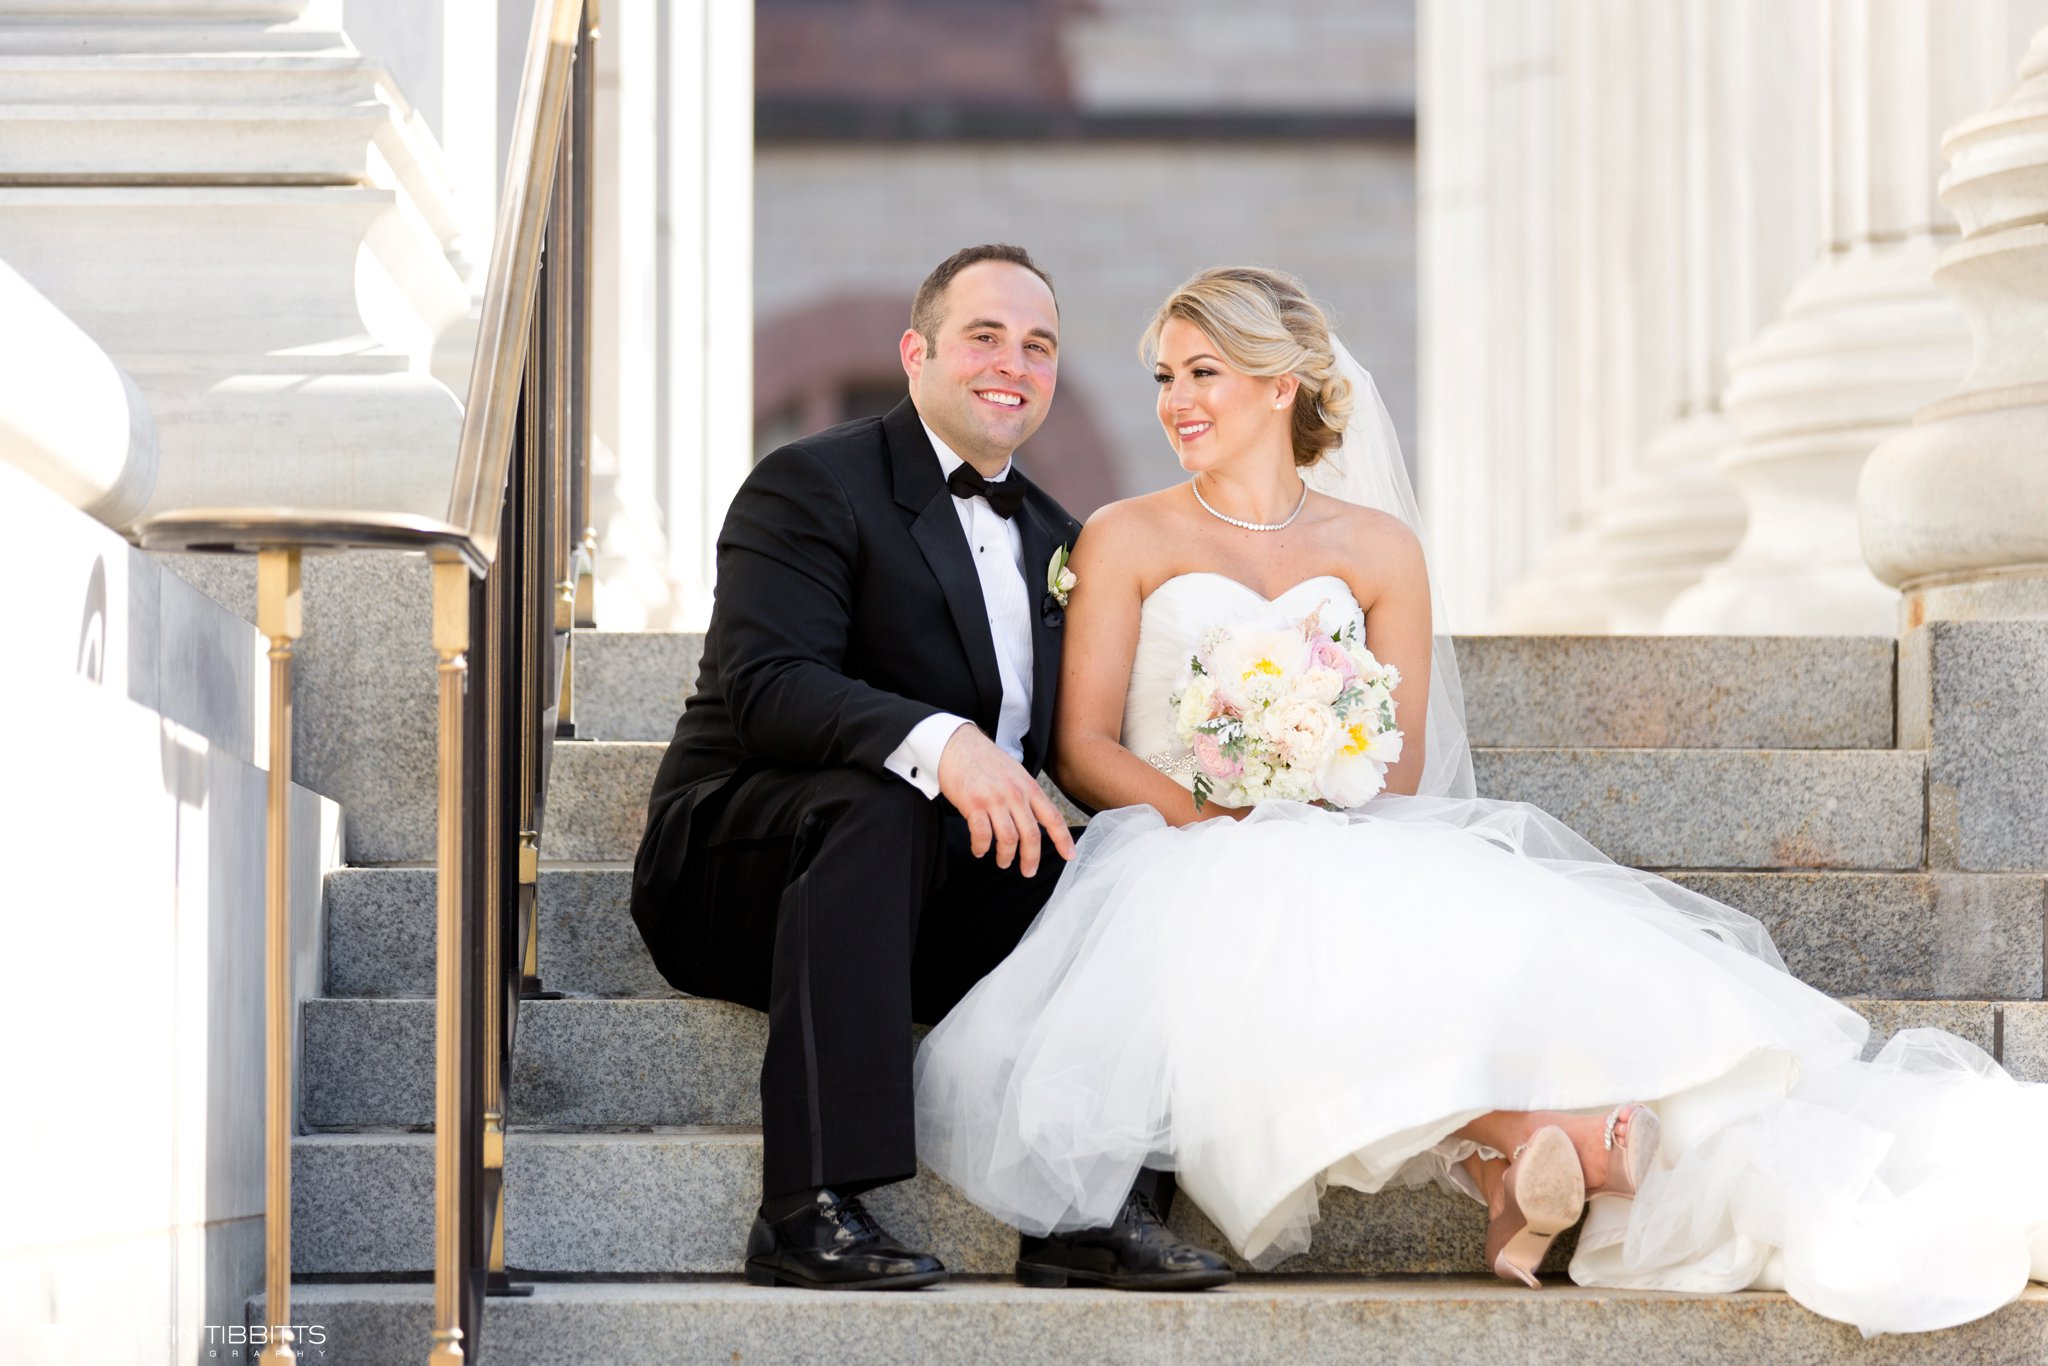 state-room-wedding-photos-with-amanda-and-nick_0120